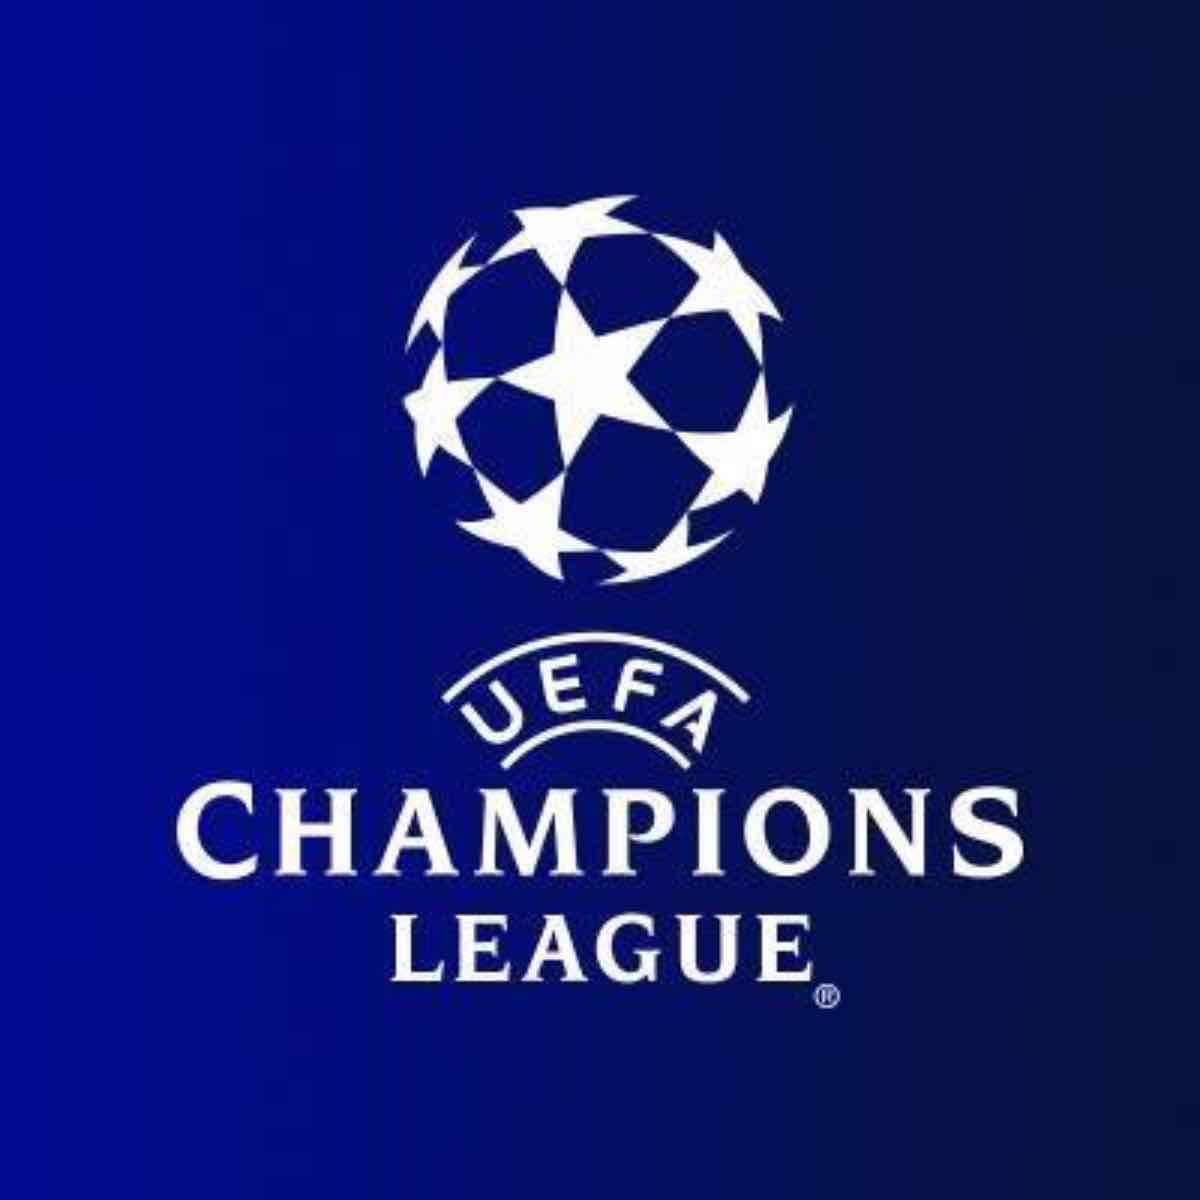 Champions League Info